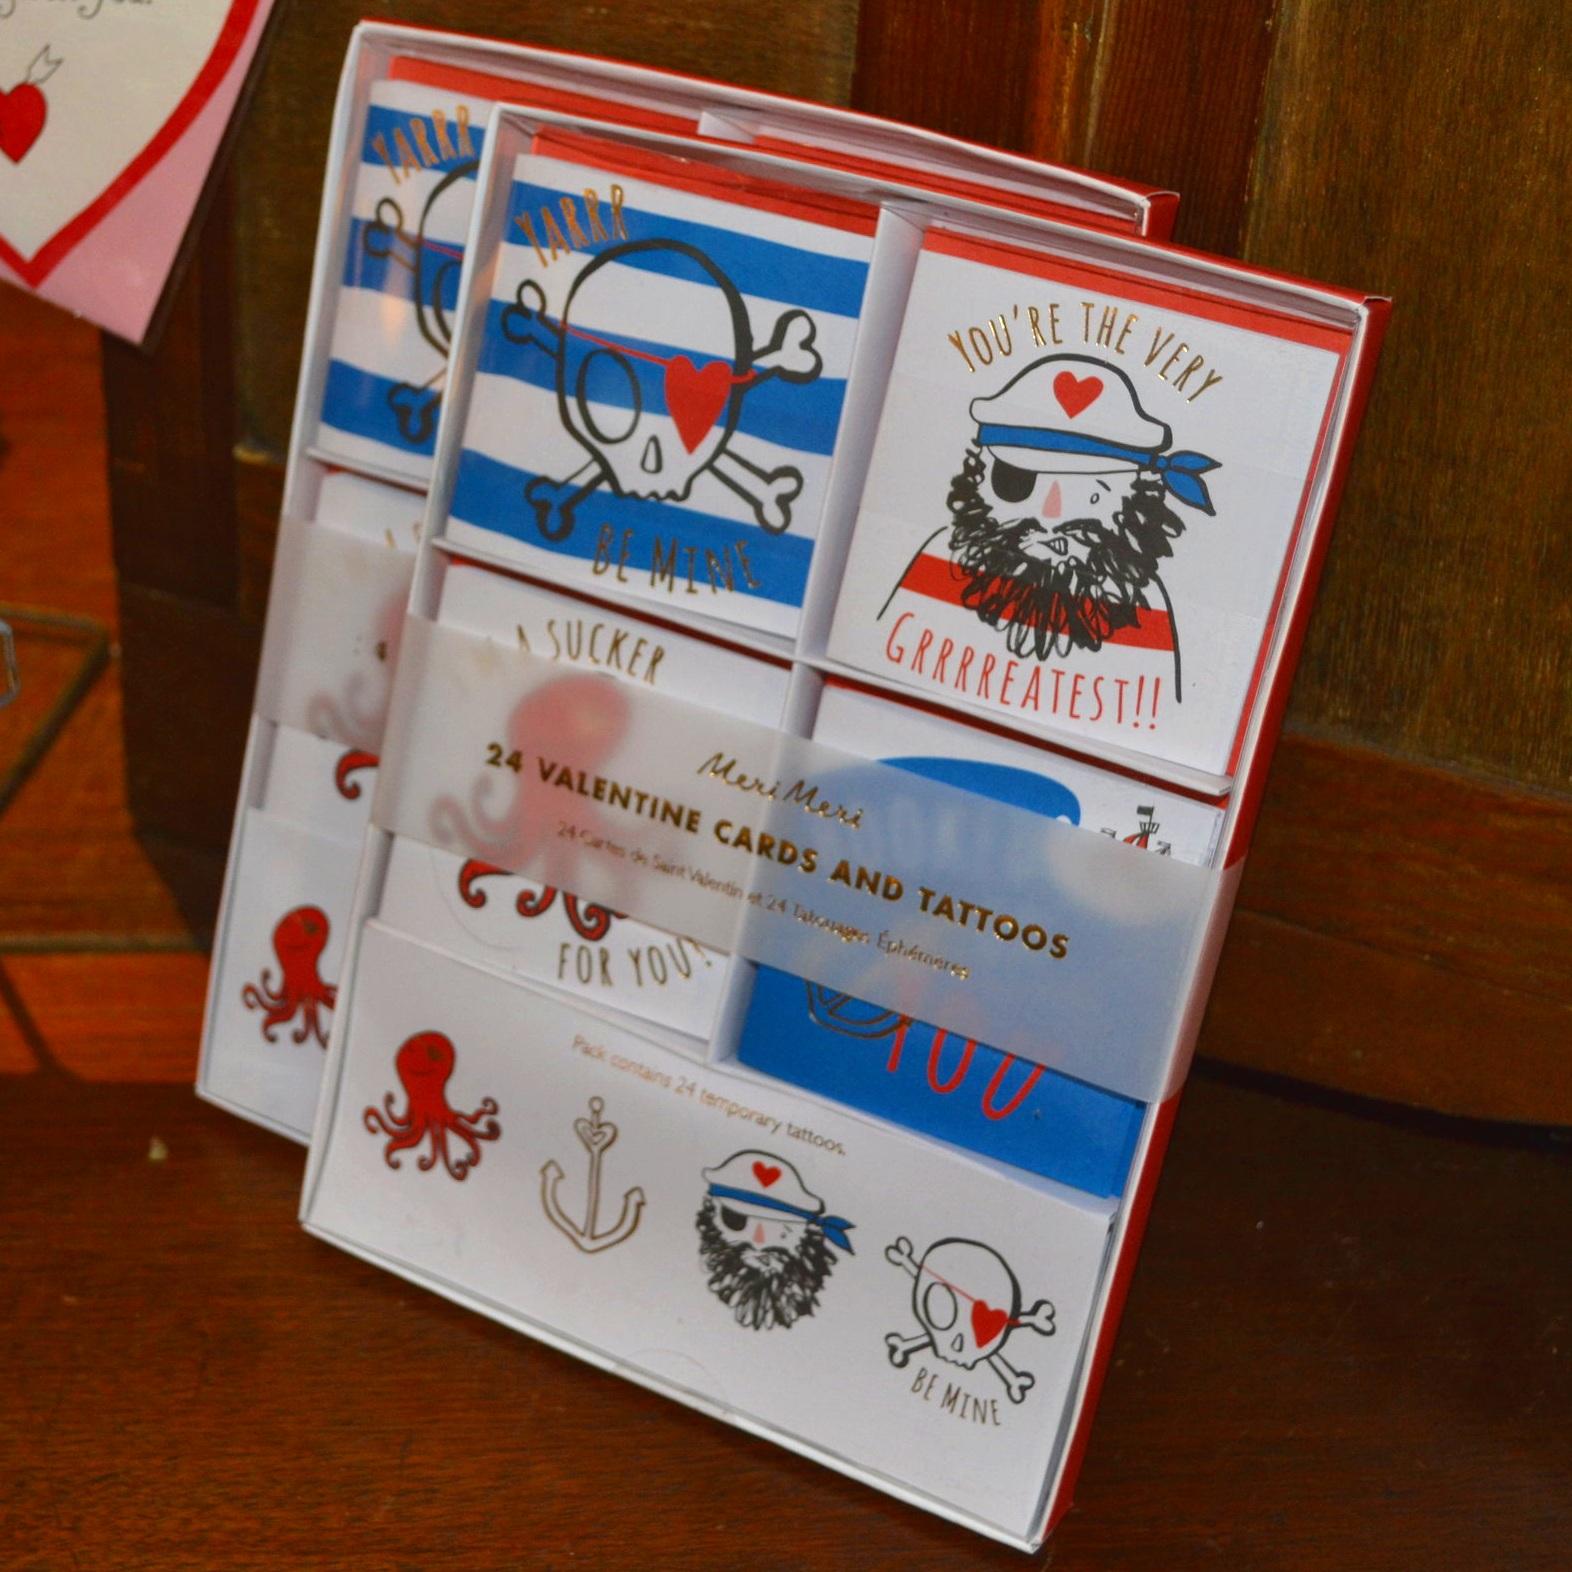 Box of 24 Pirate Valentine Cards & Tattoos